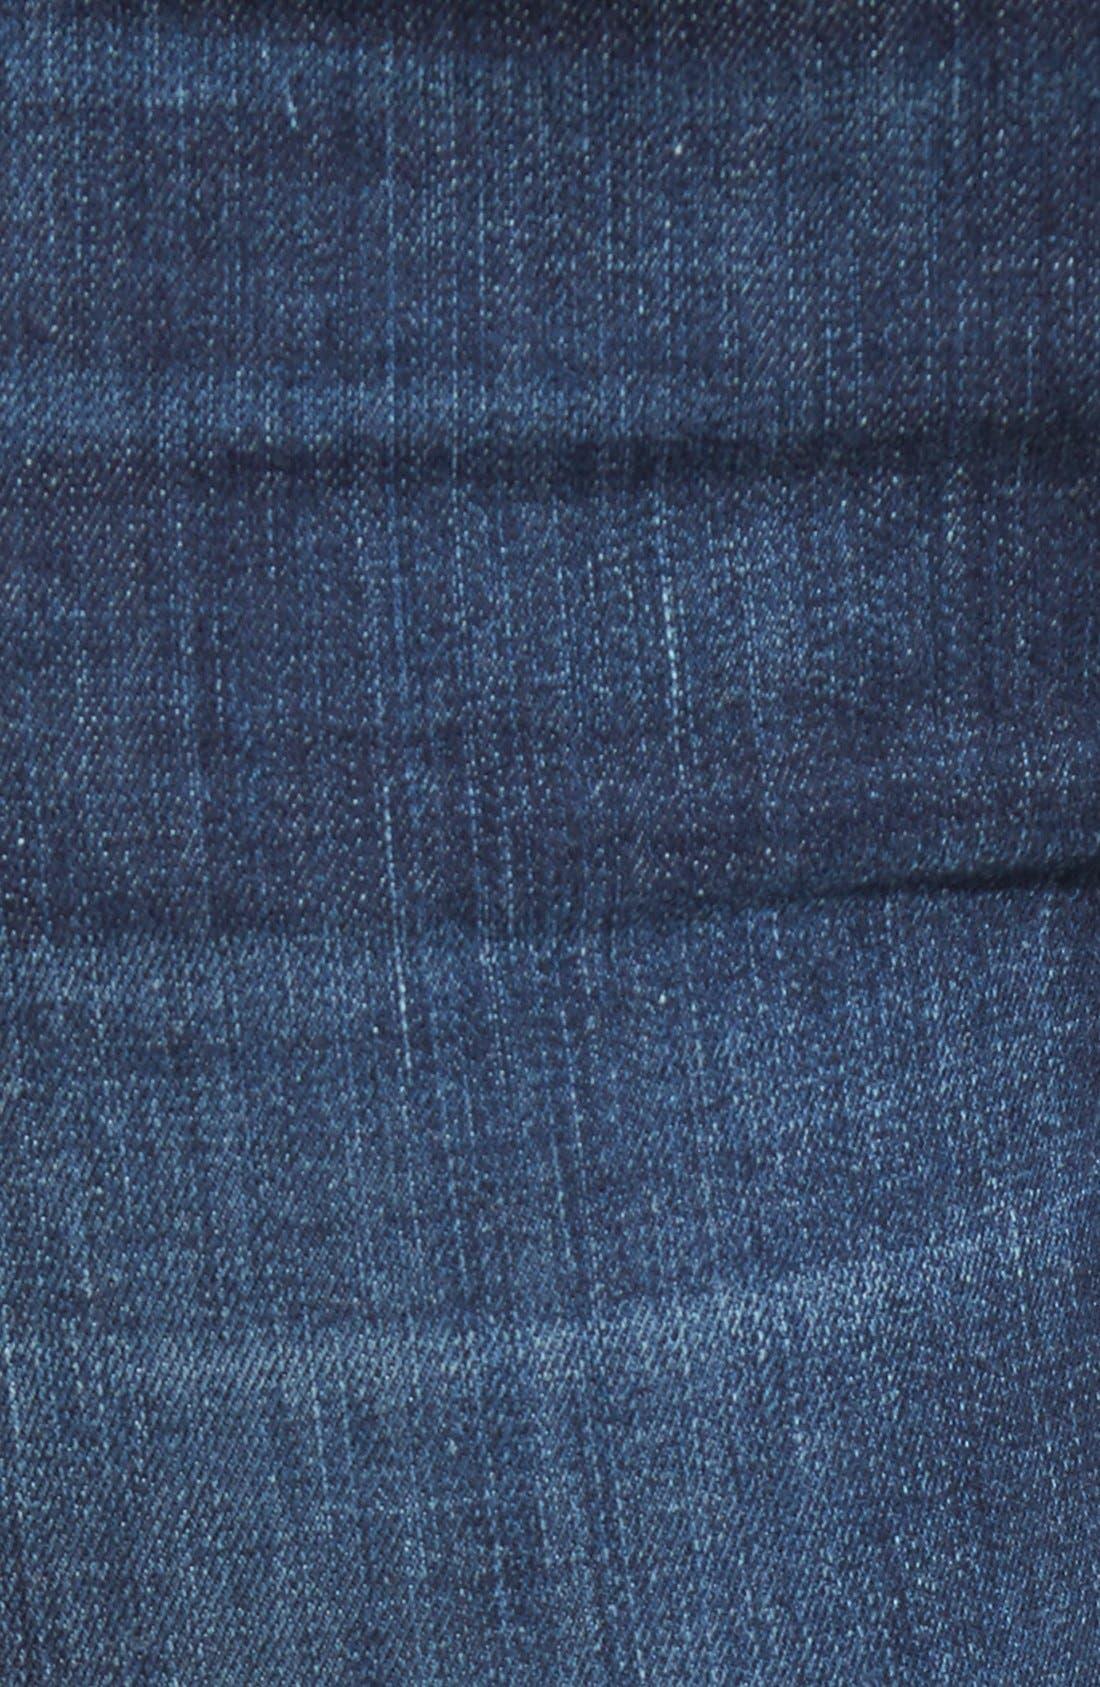 'Halle' Skinny Jeans,                             Alternate thumbnail 5, color,                             402